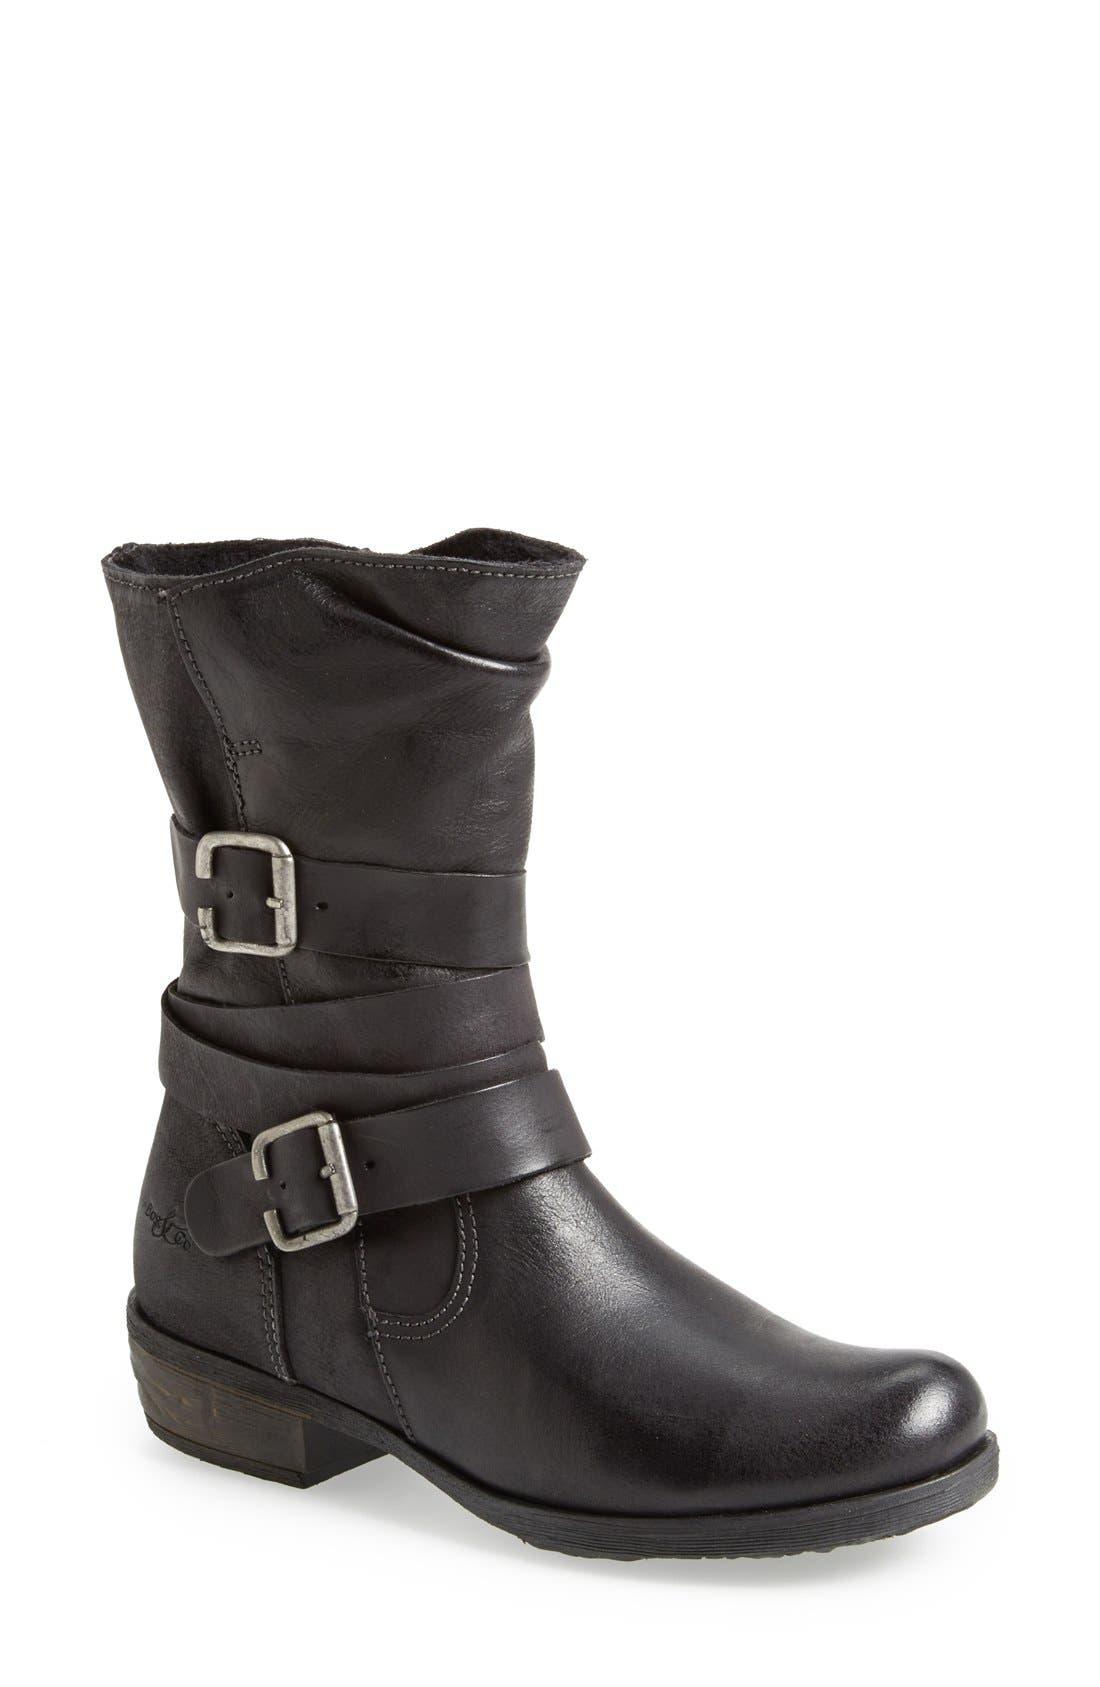 Alternate Image 1 Selected - Bos. & Co. 'Katie' Waterproof Leather Moto Boot (Women)